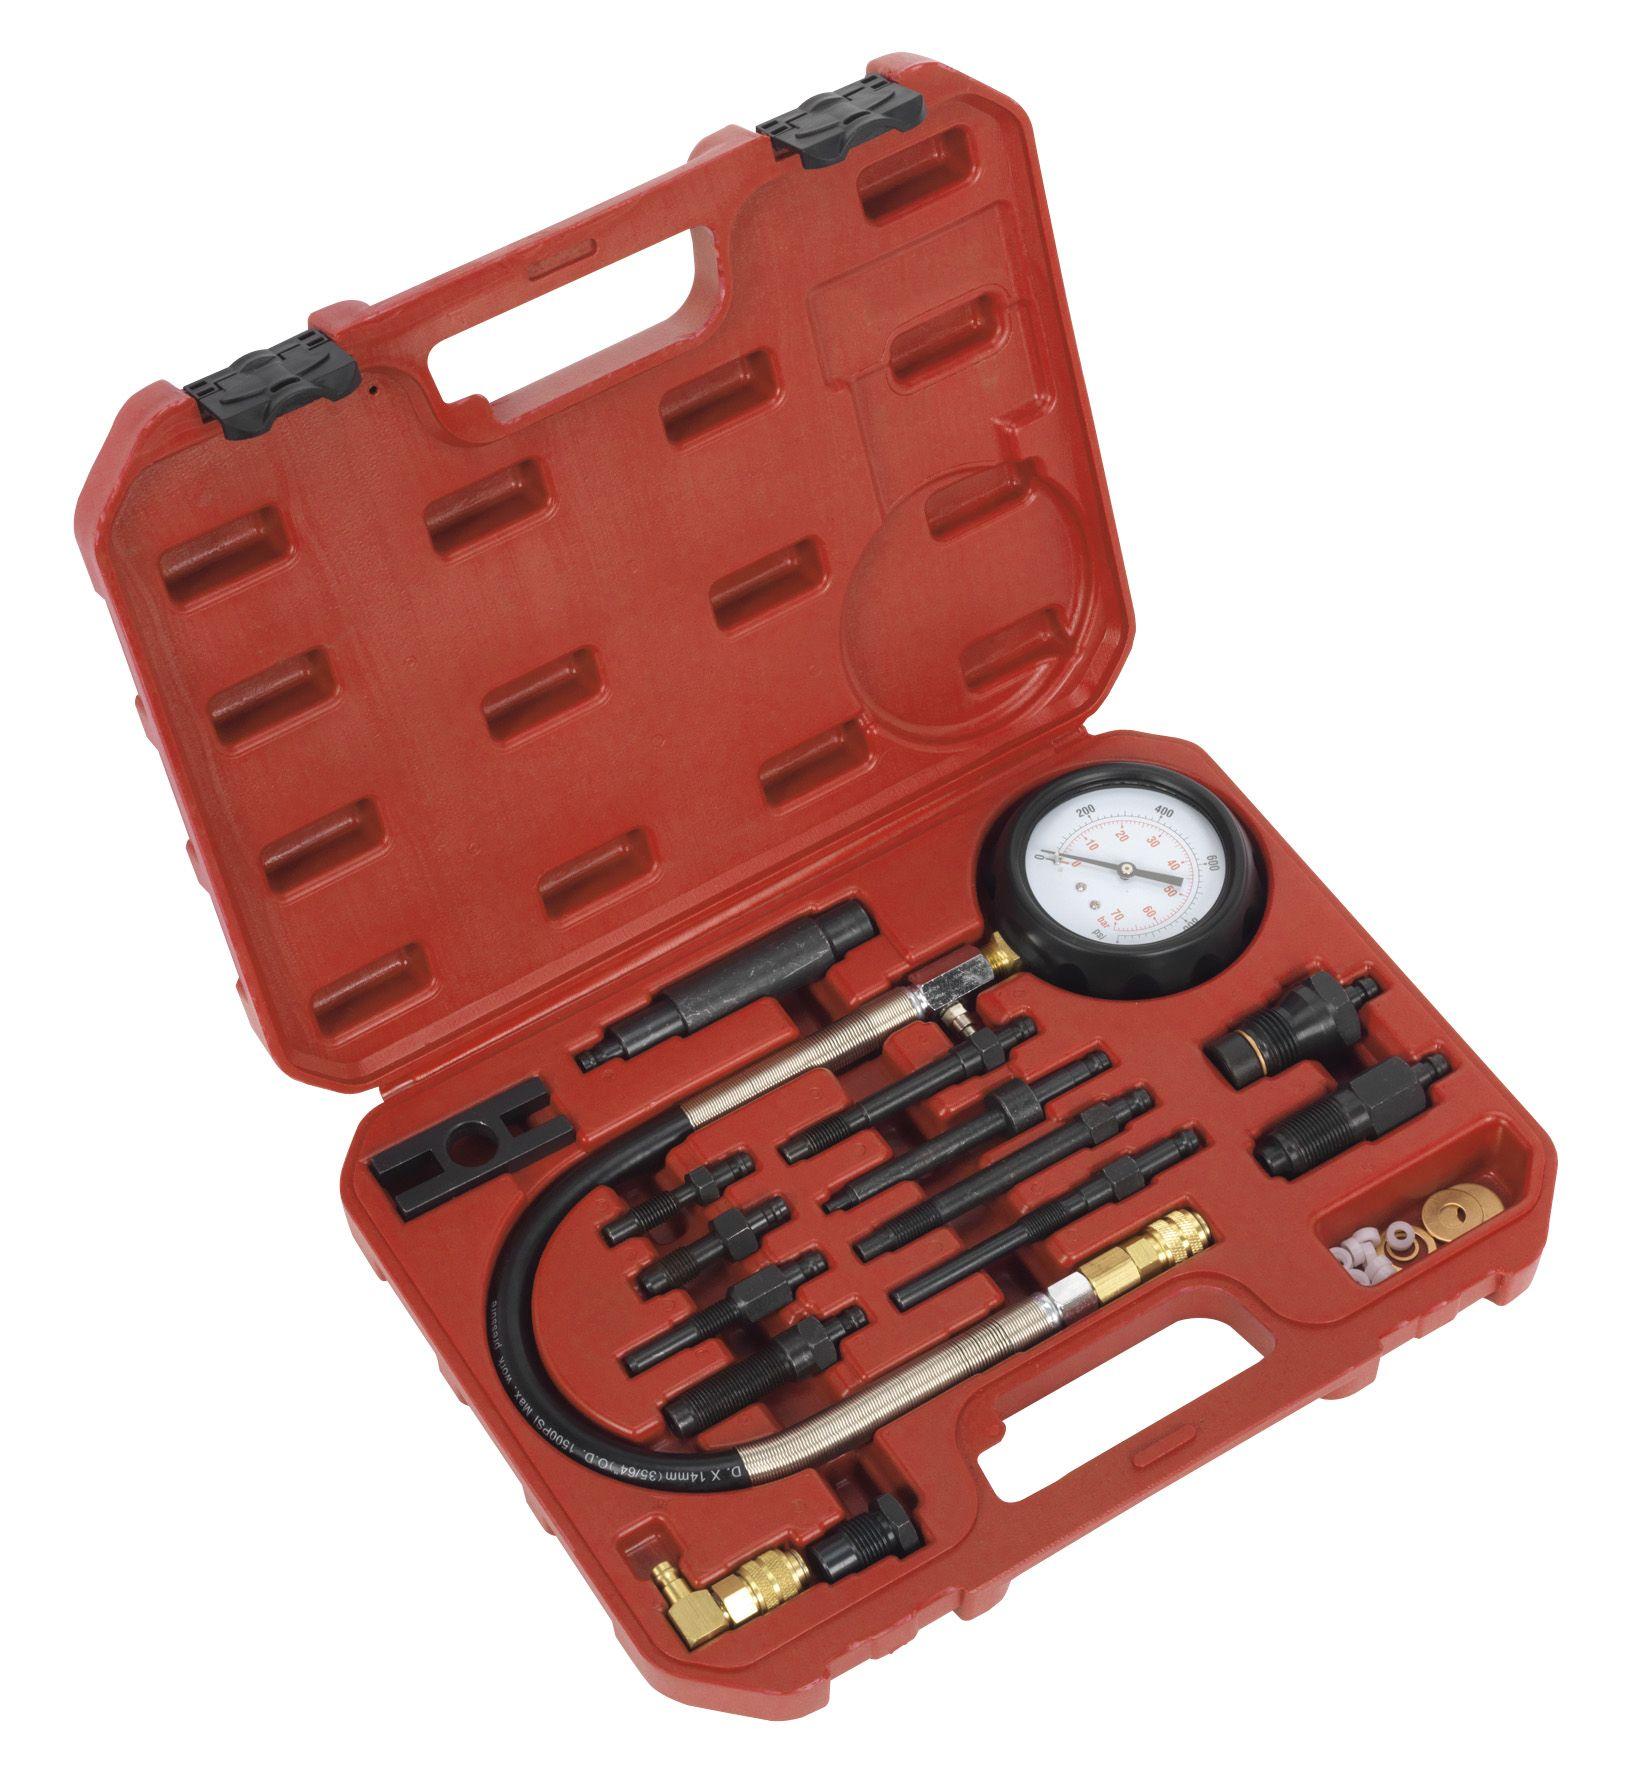 Sealey Diesel Engine Compression Test Kit